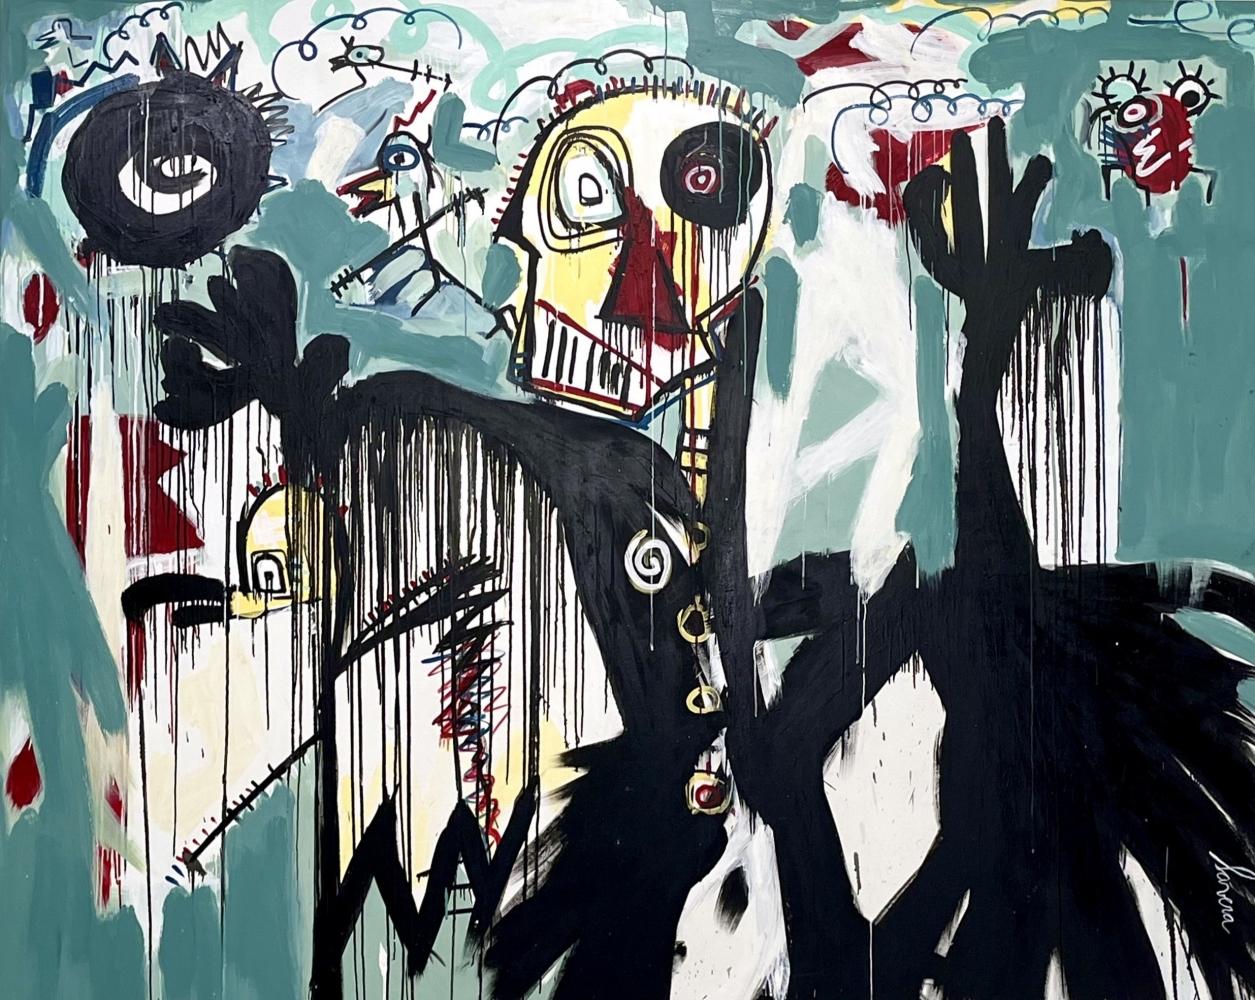 fernanda Lavera, Huyendo II, 2019, Acrylic painting on canvas, Graffiti and street art For sale at Manolis Projects Gallery, Miami. FL